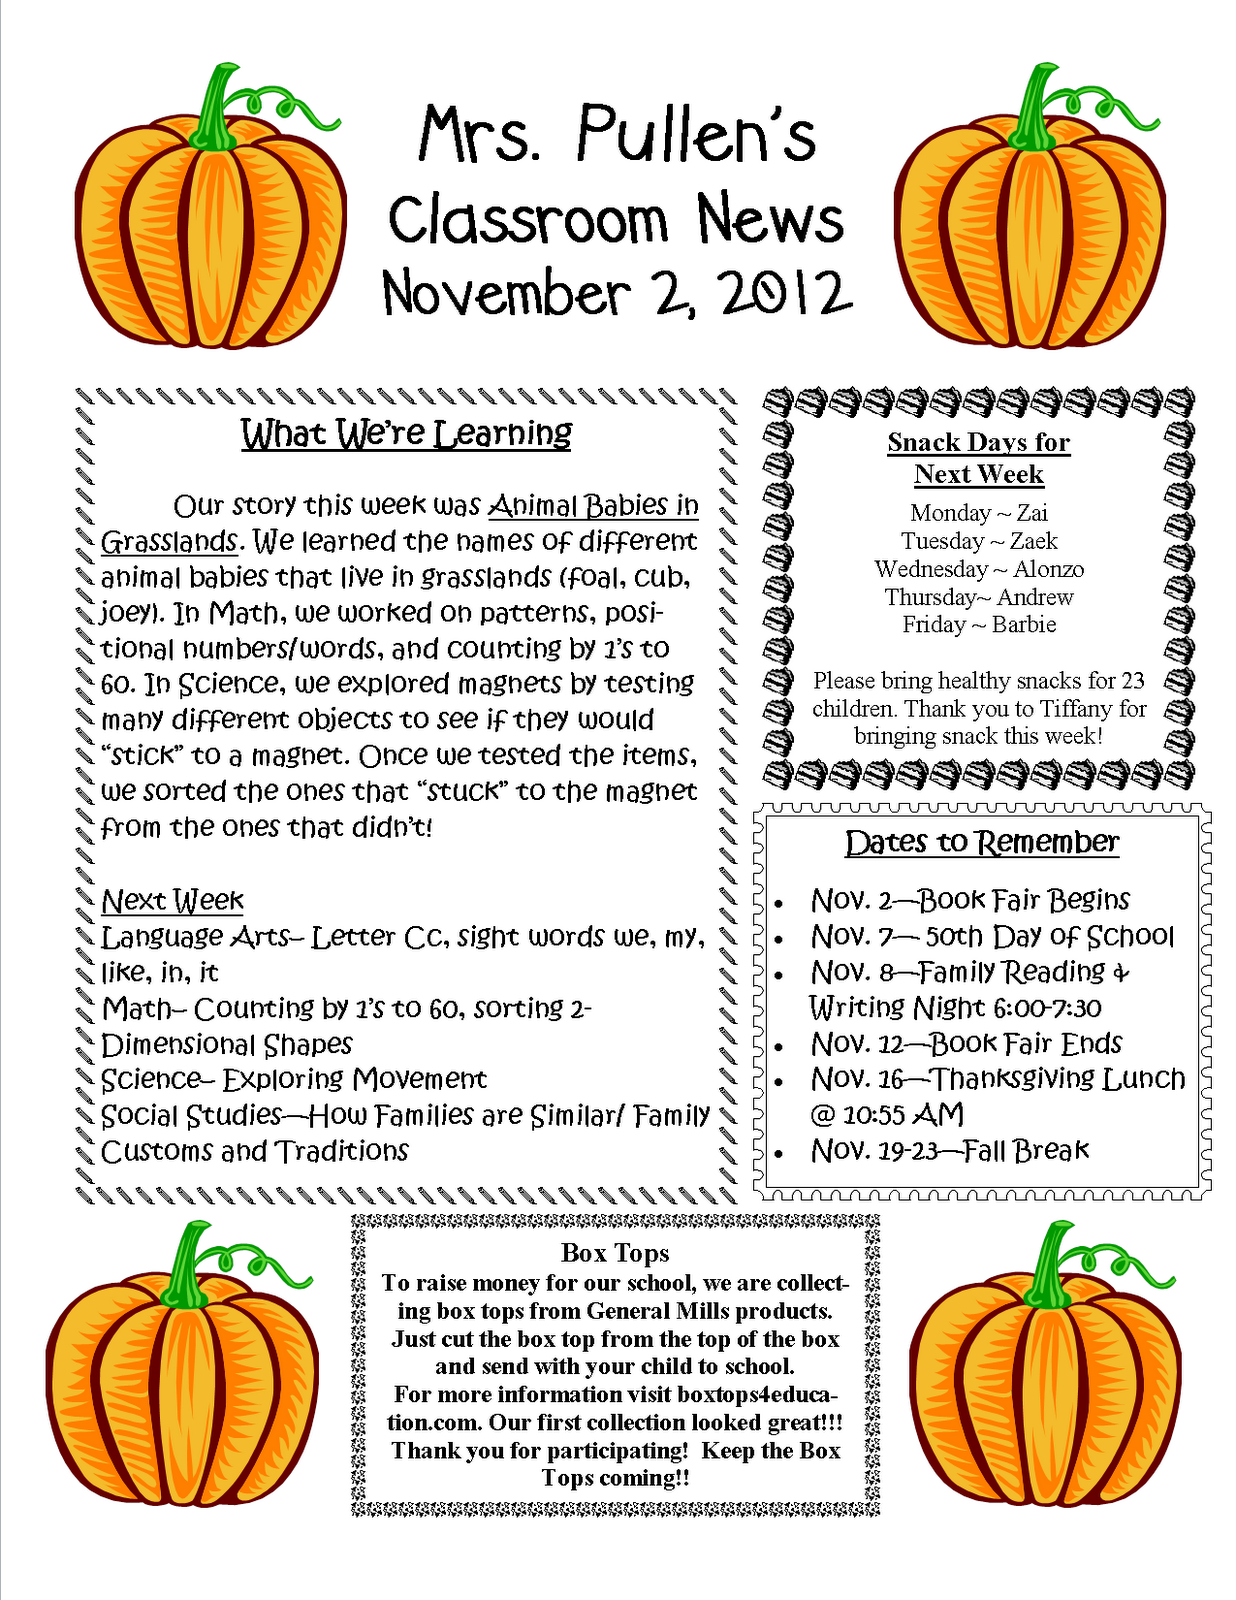 Mrs. Pullen's Kindergarten Class: November 2, 2012 Newsletter